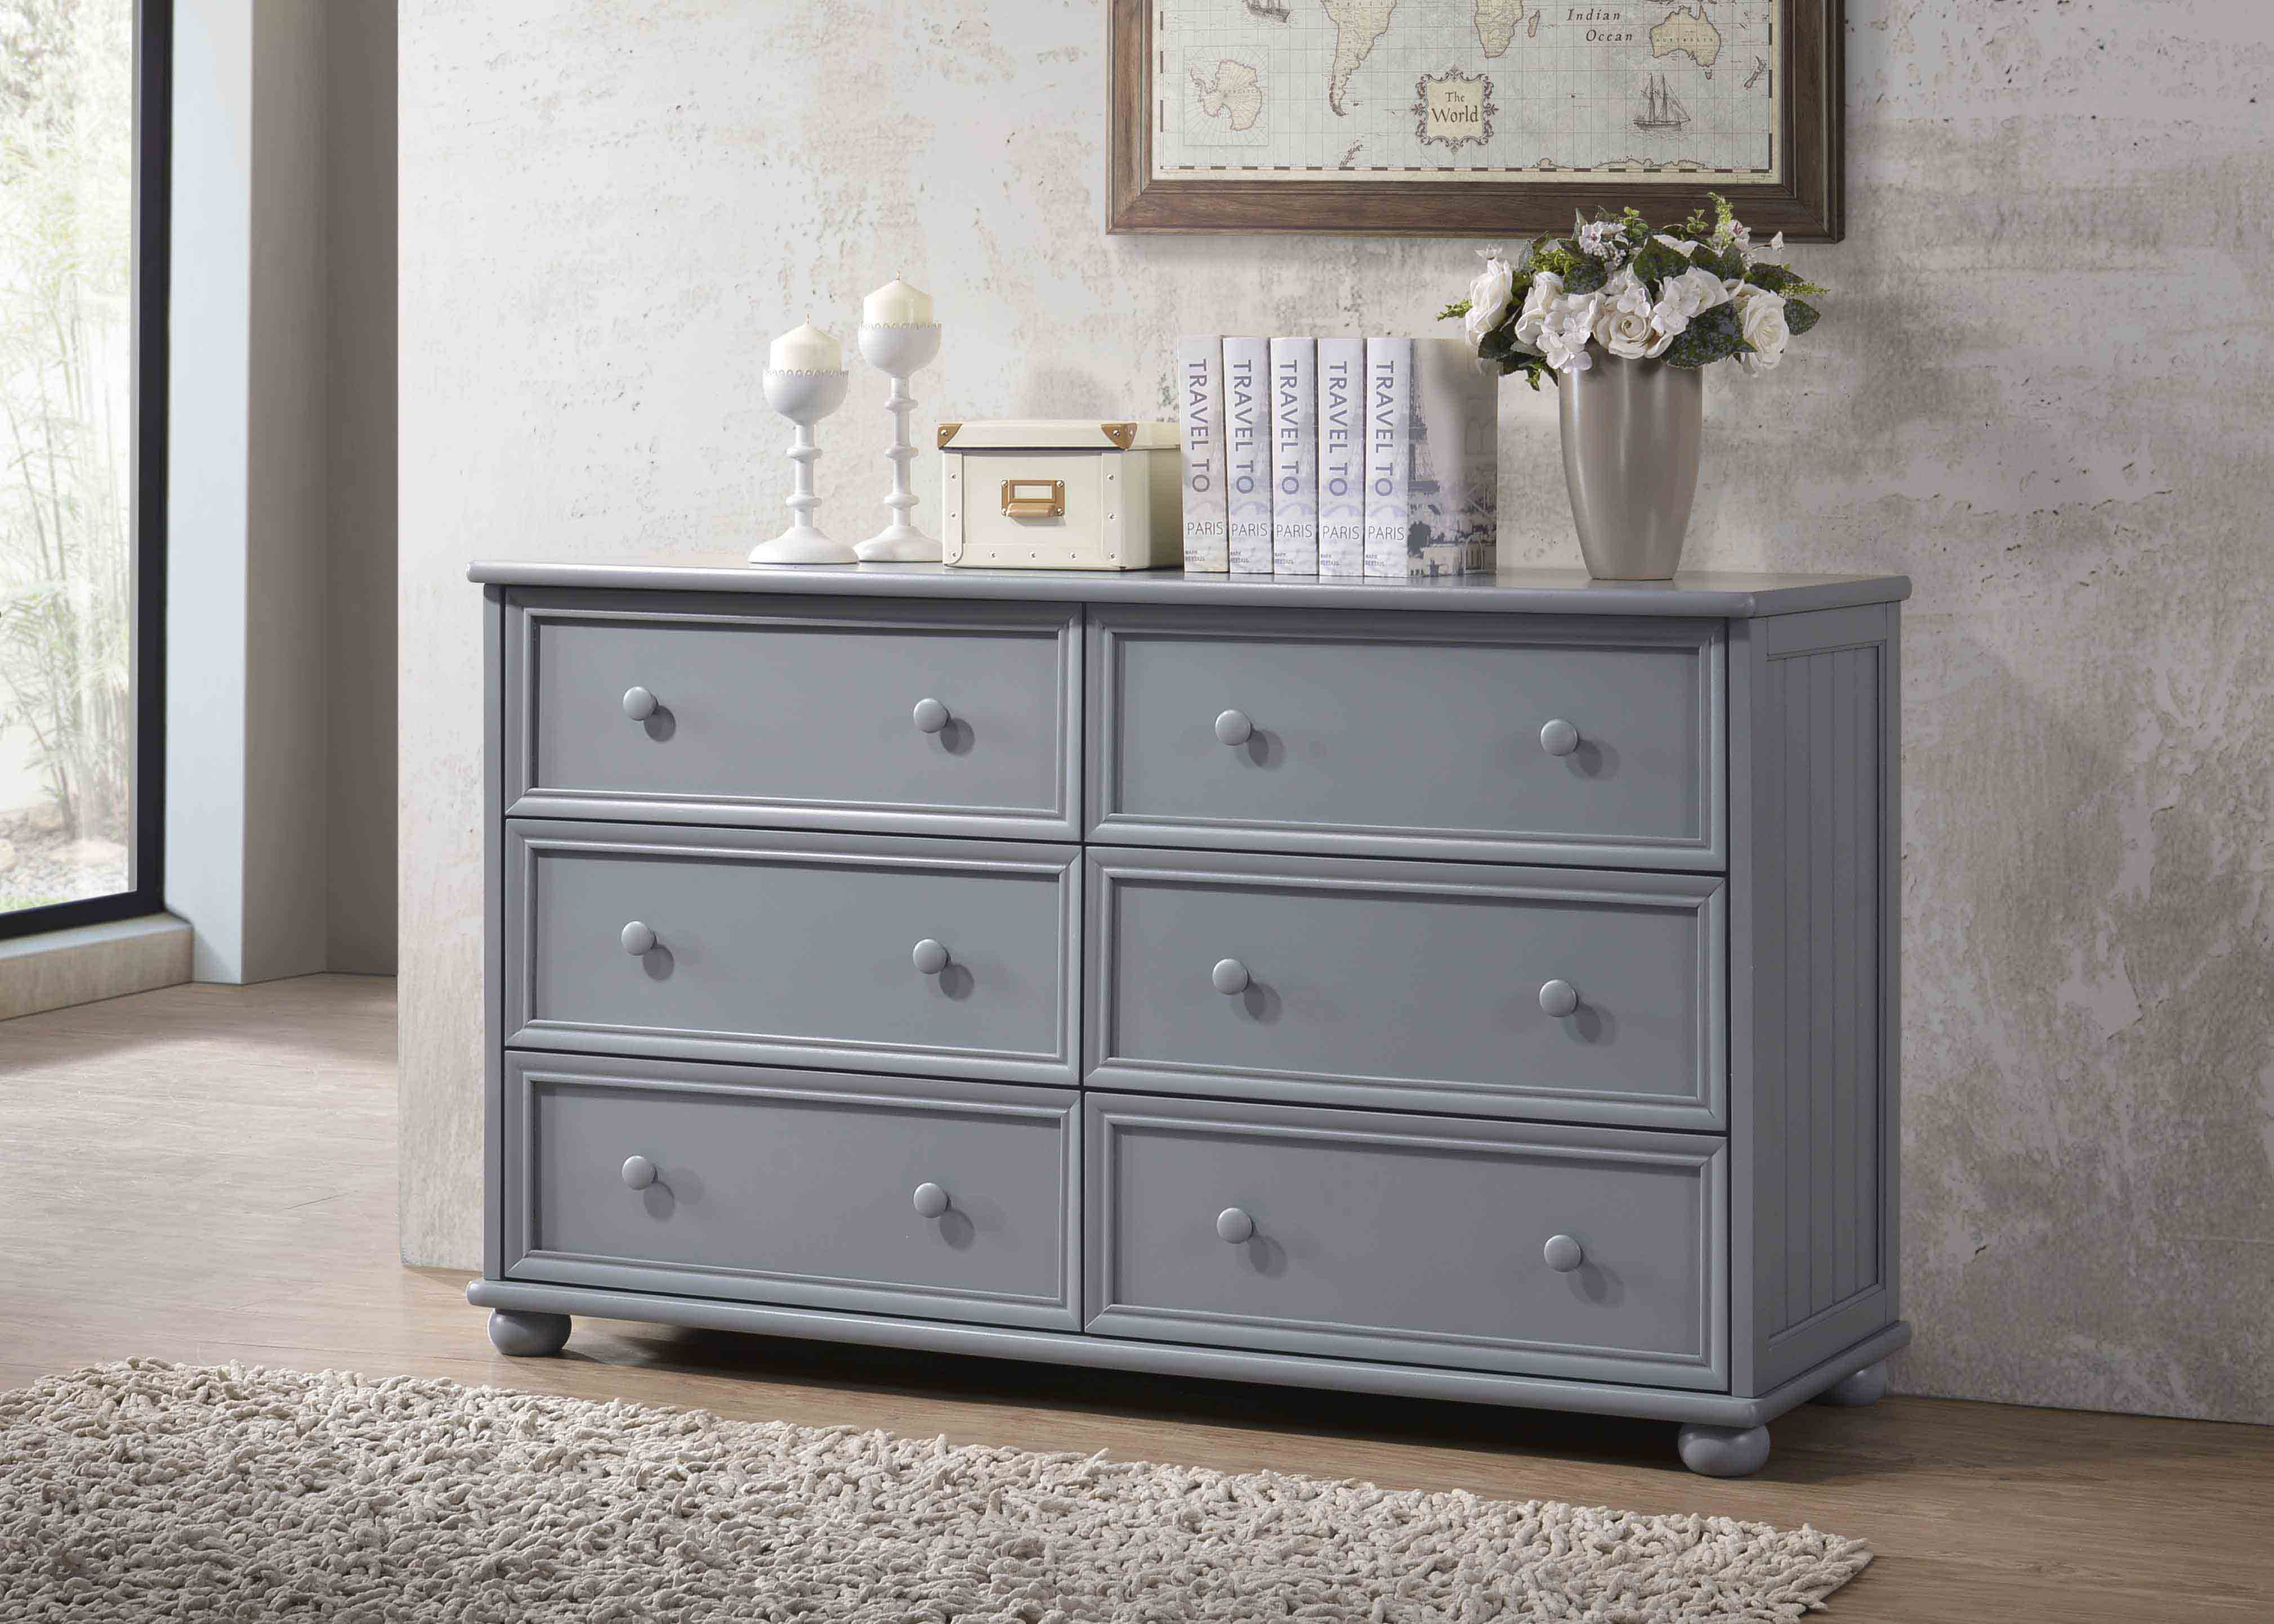 6 Drawer Dresser. J.A.Y. Furniture